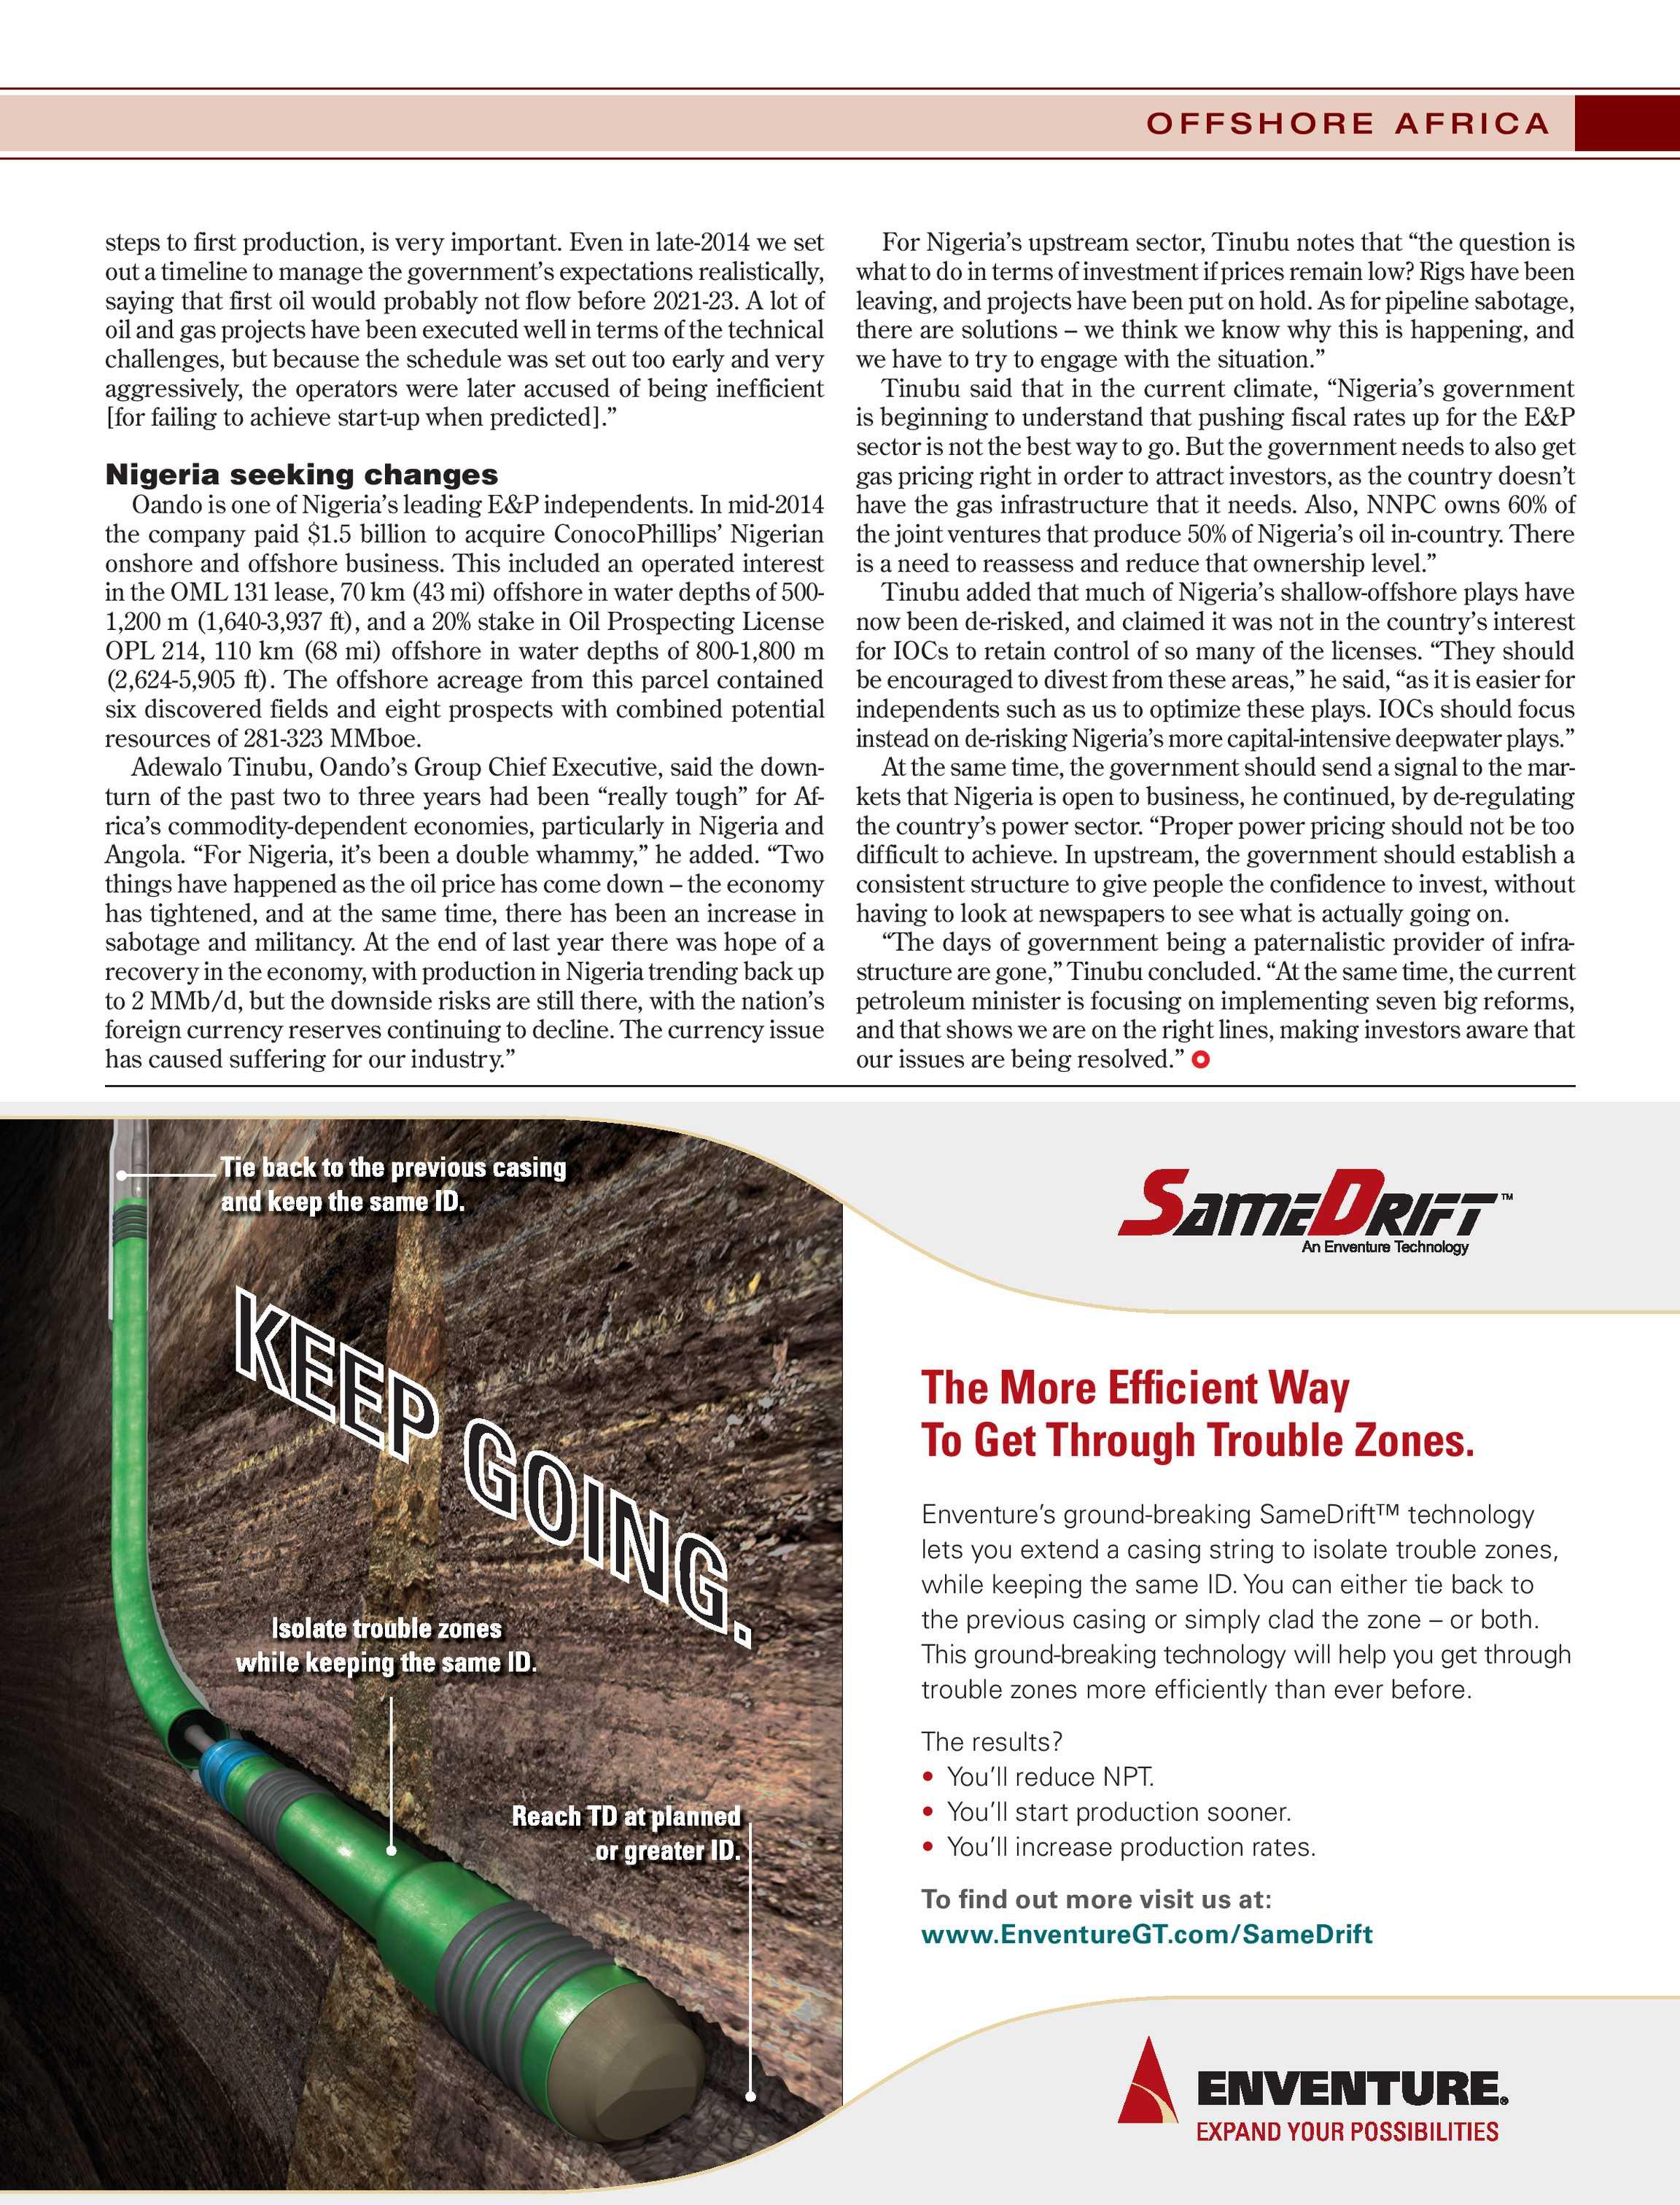 Offshore Magazine - April 2017 - page 29